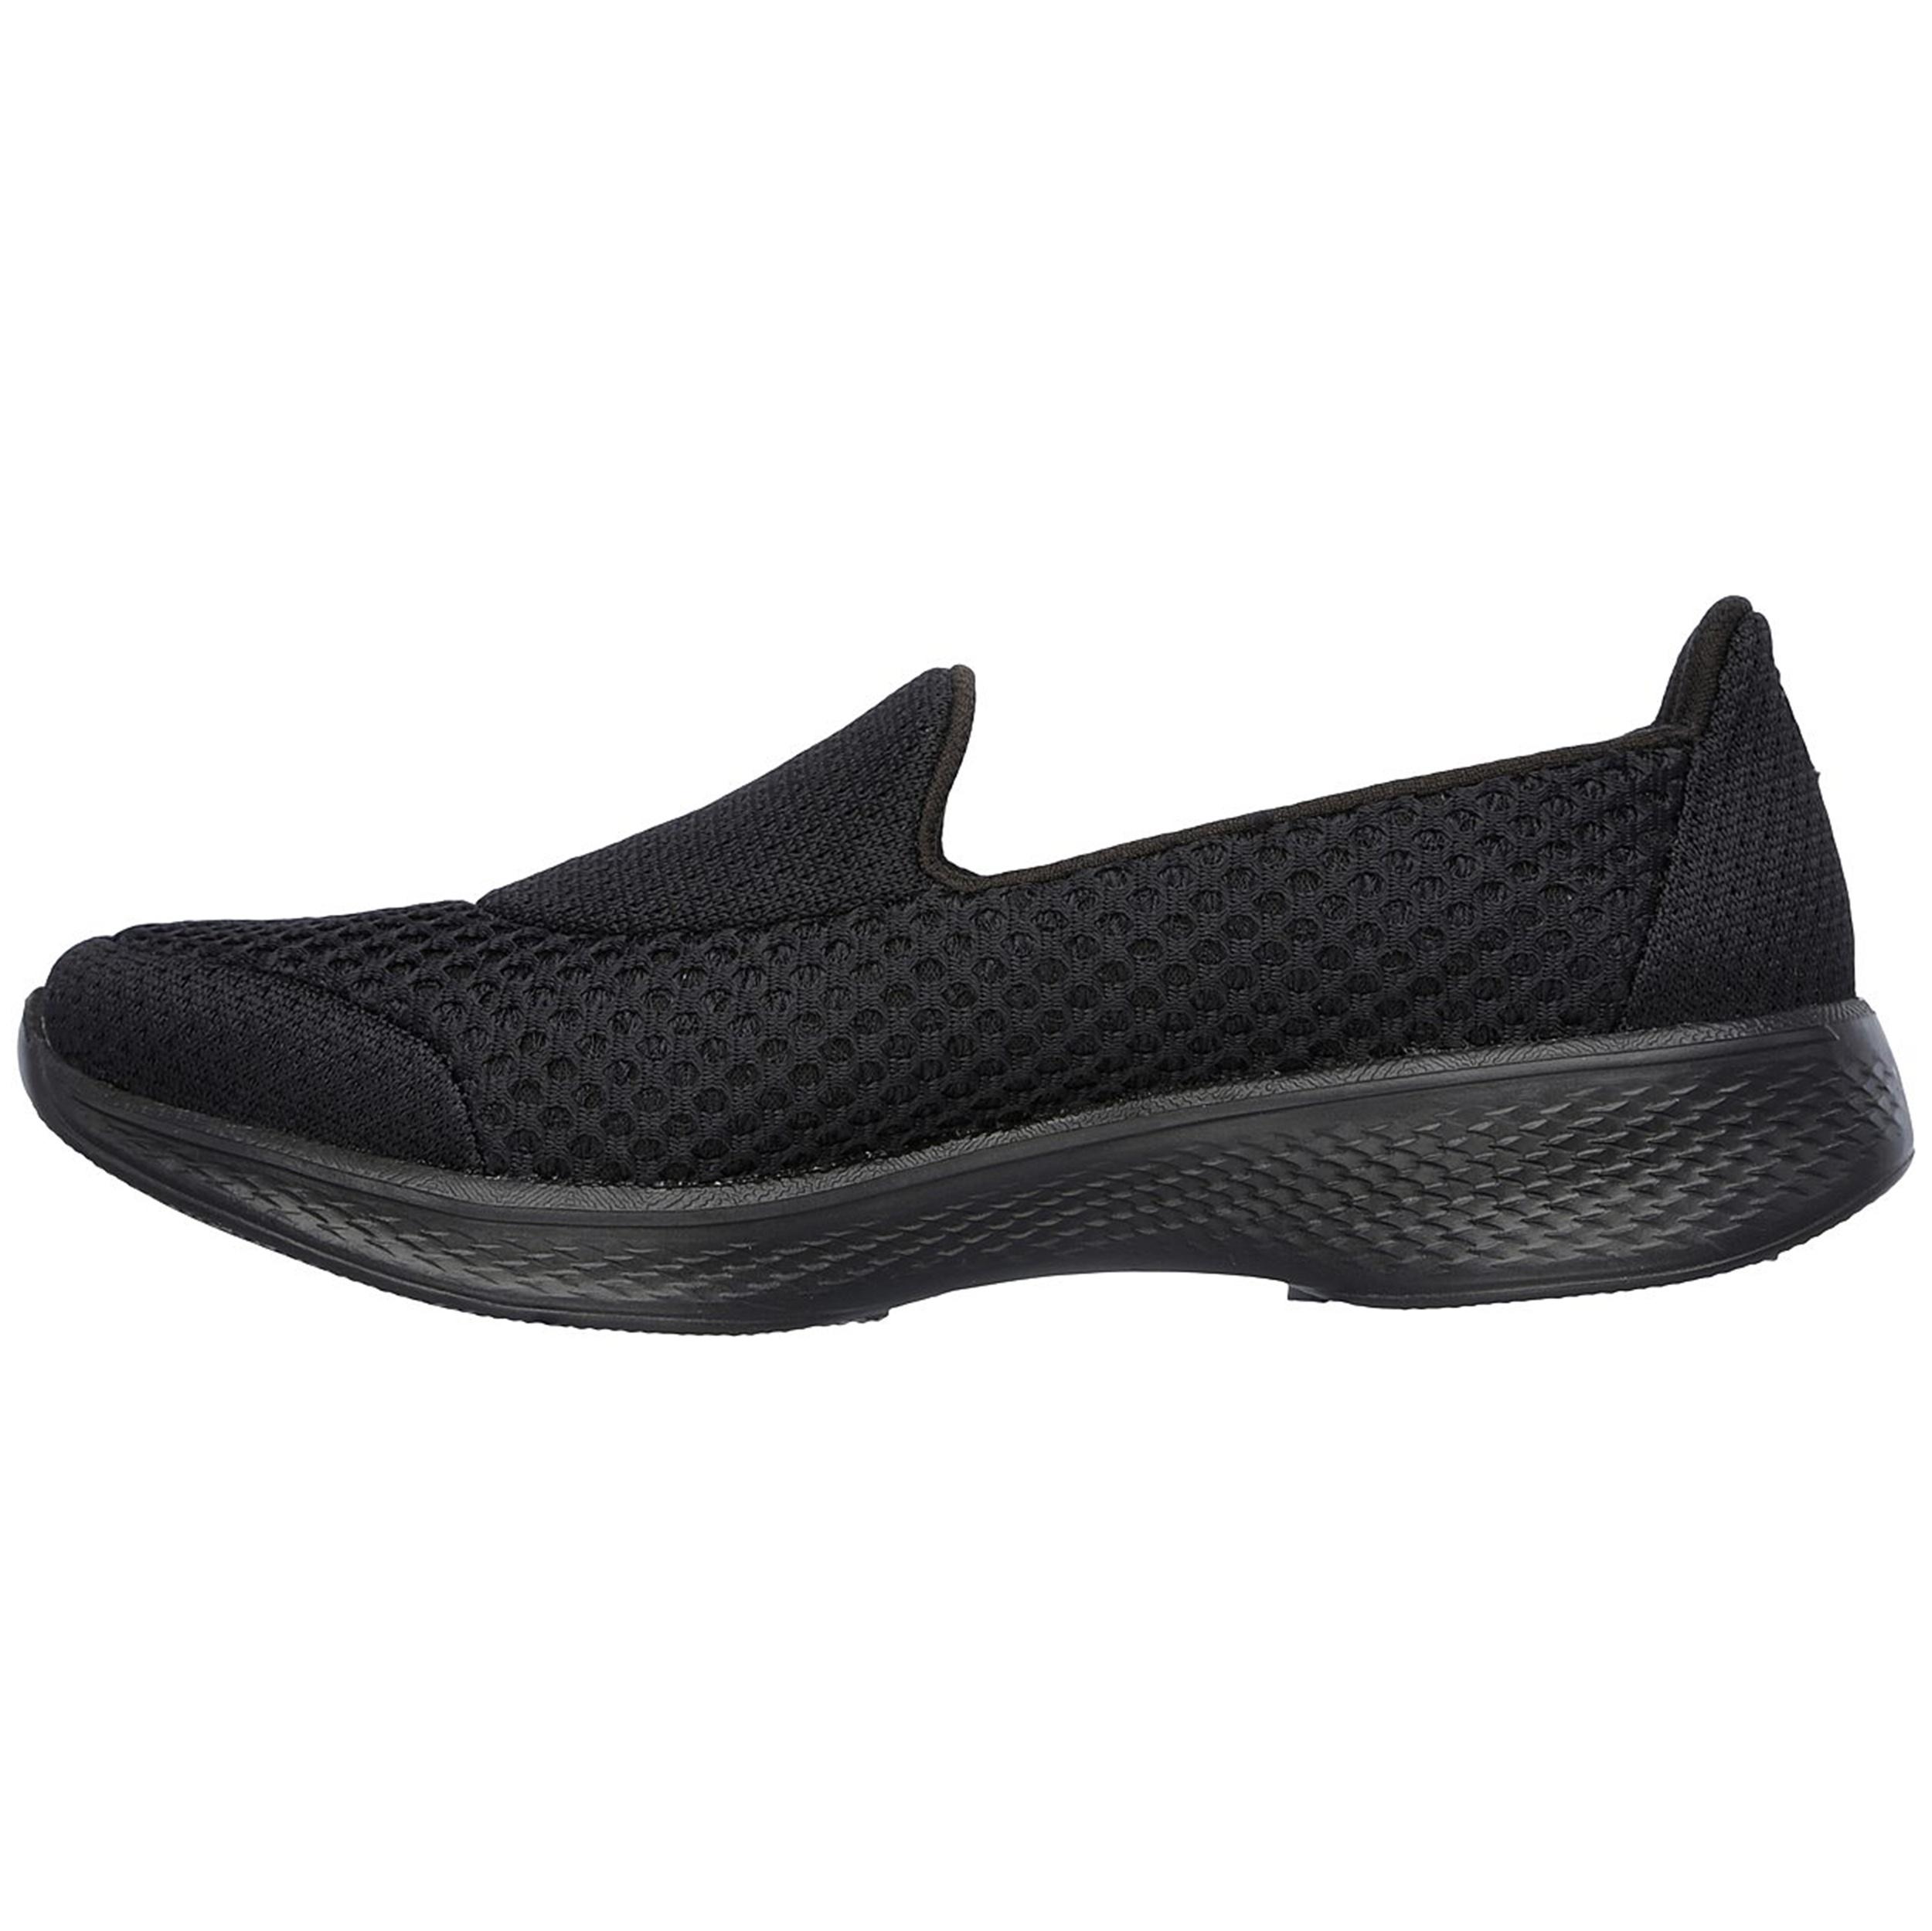 کفش راحتی زنانه اسکچرز مدل MIRACLE 14145BBK